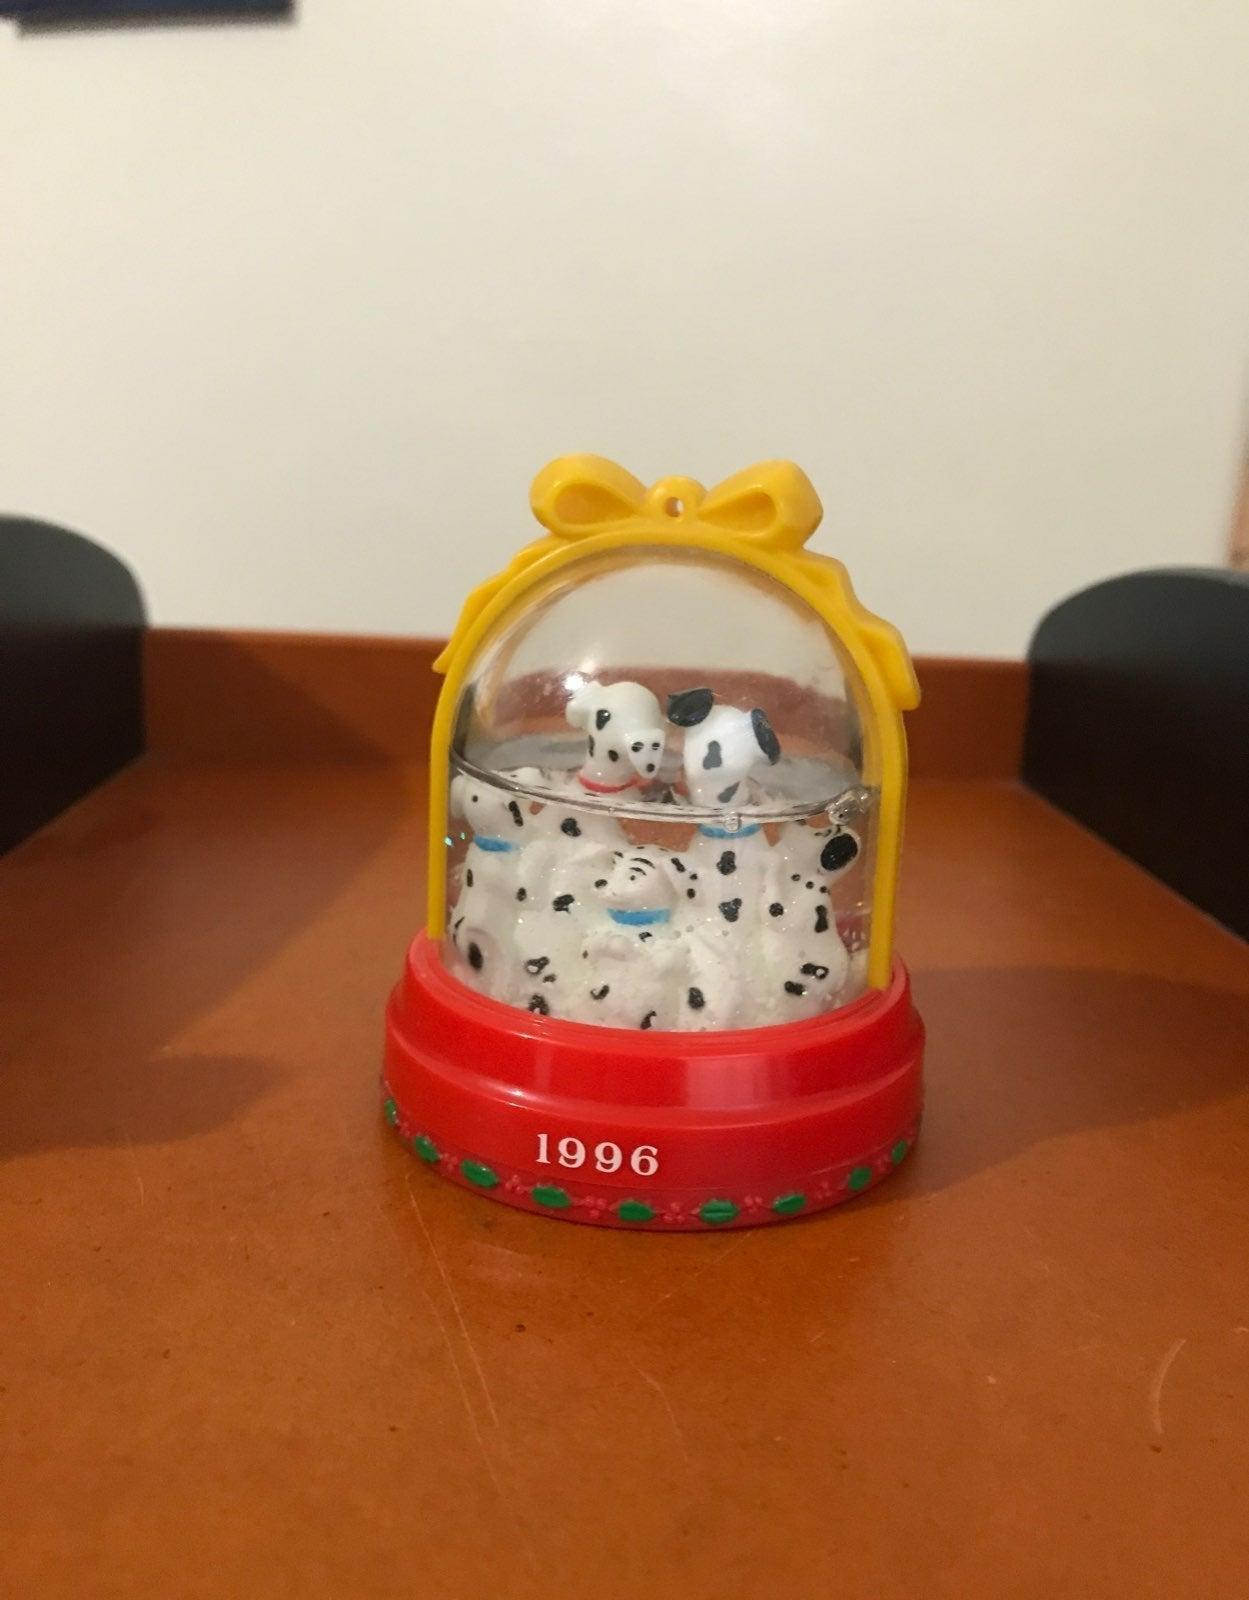 101 Dalmatians by Disney 1996